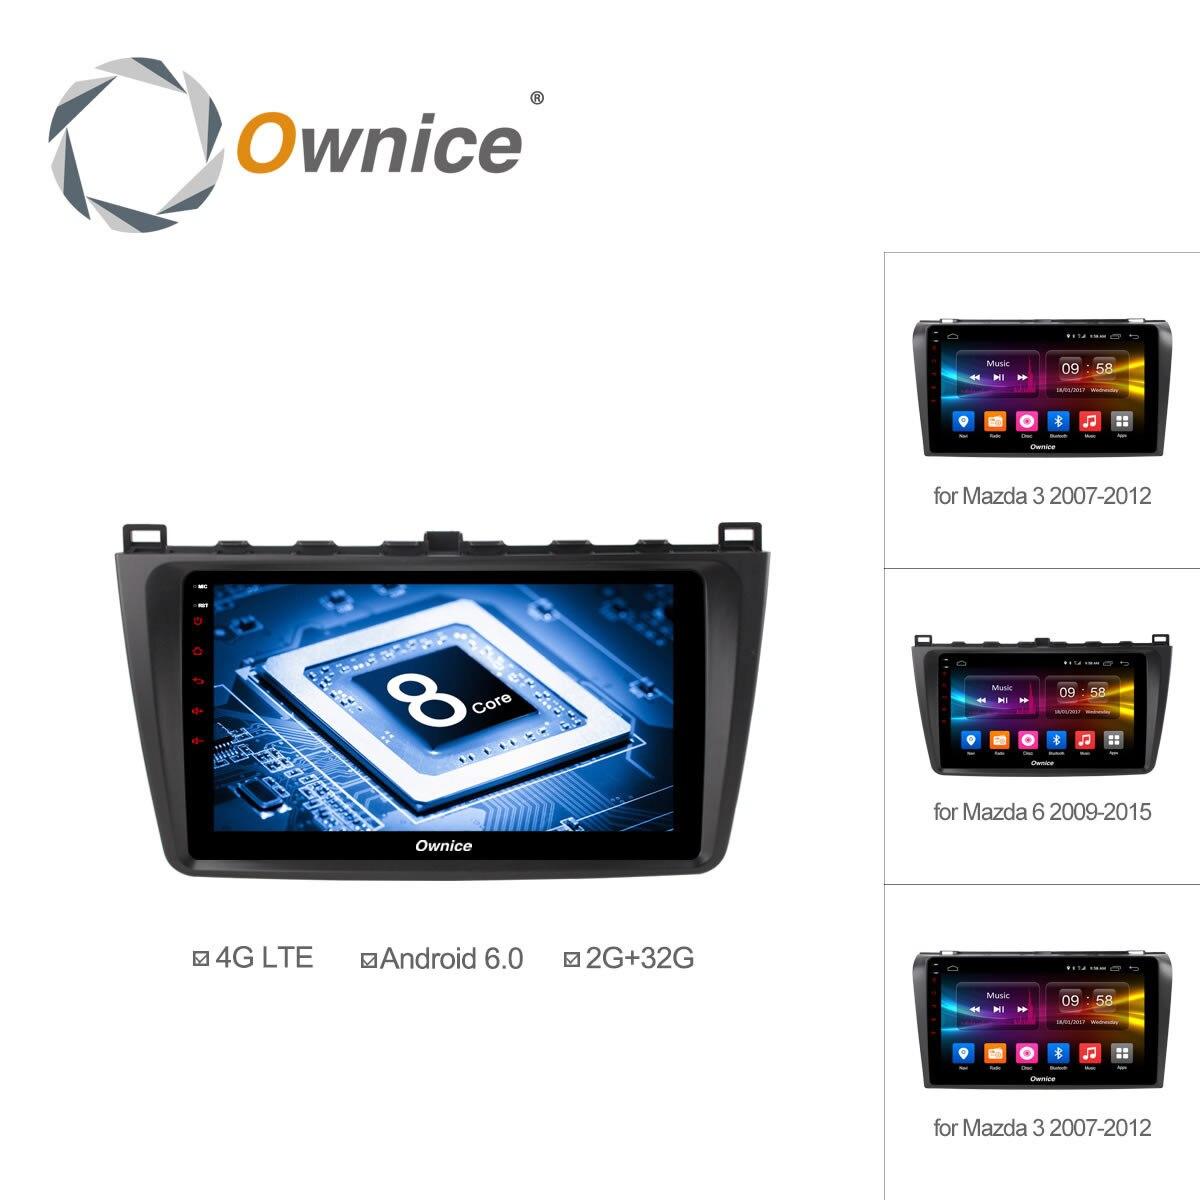 9 inch ownice c500 2g 32gb android 6 0 car dvd for mazda 6 mazda 3 gps navigation player octa core 4g dab radio rds carplay